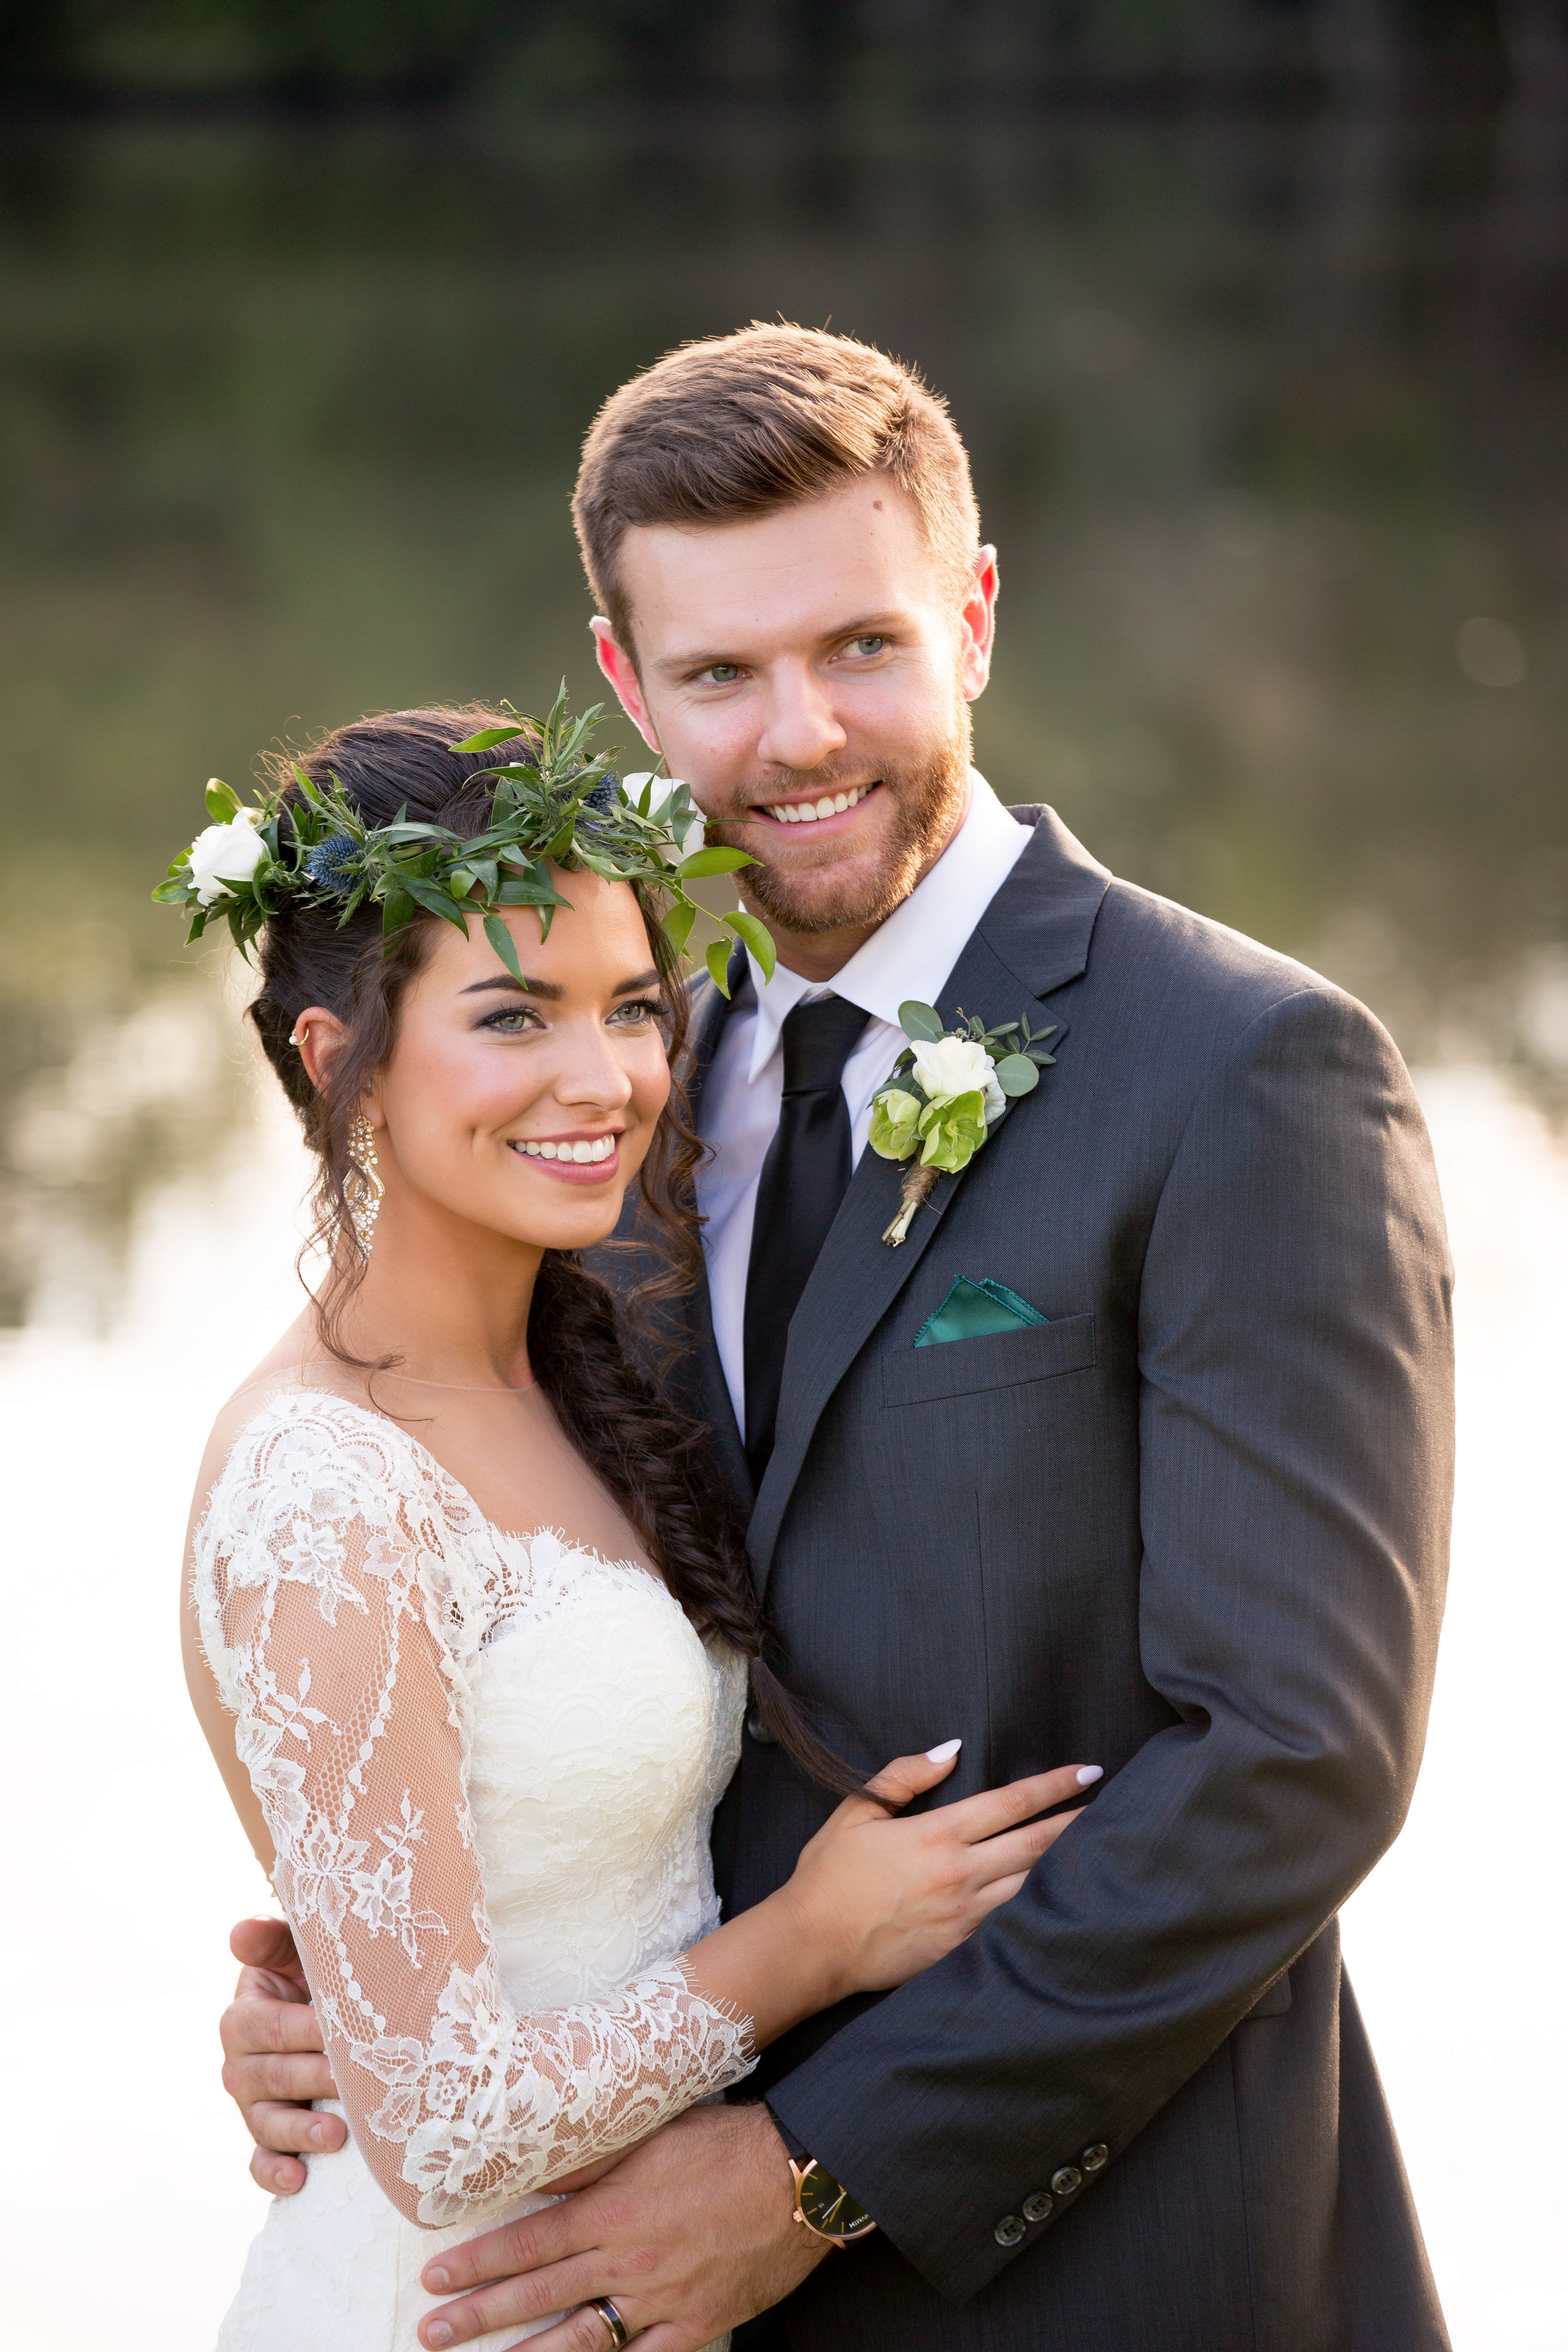 20170915_Redfern_Wedding_5622.jpg